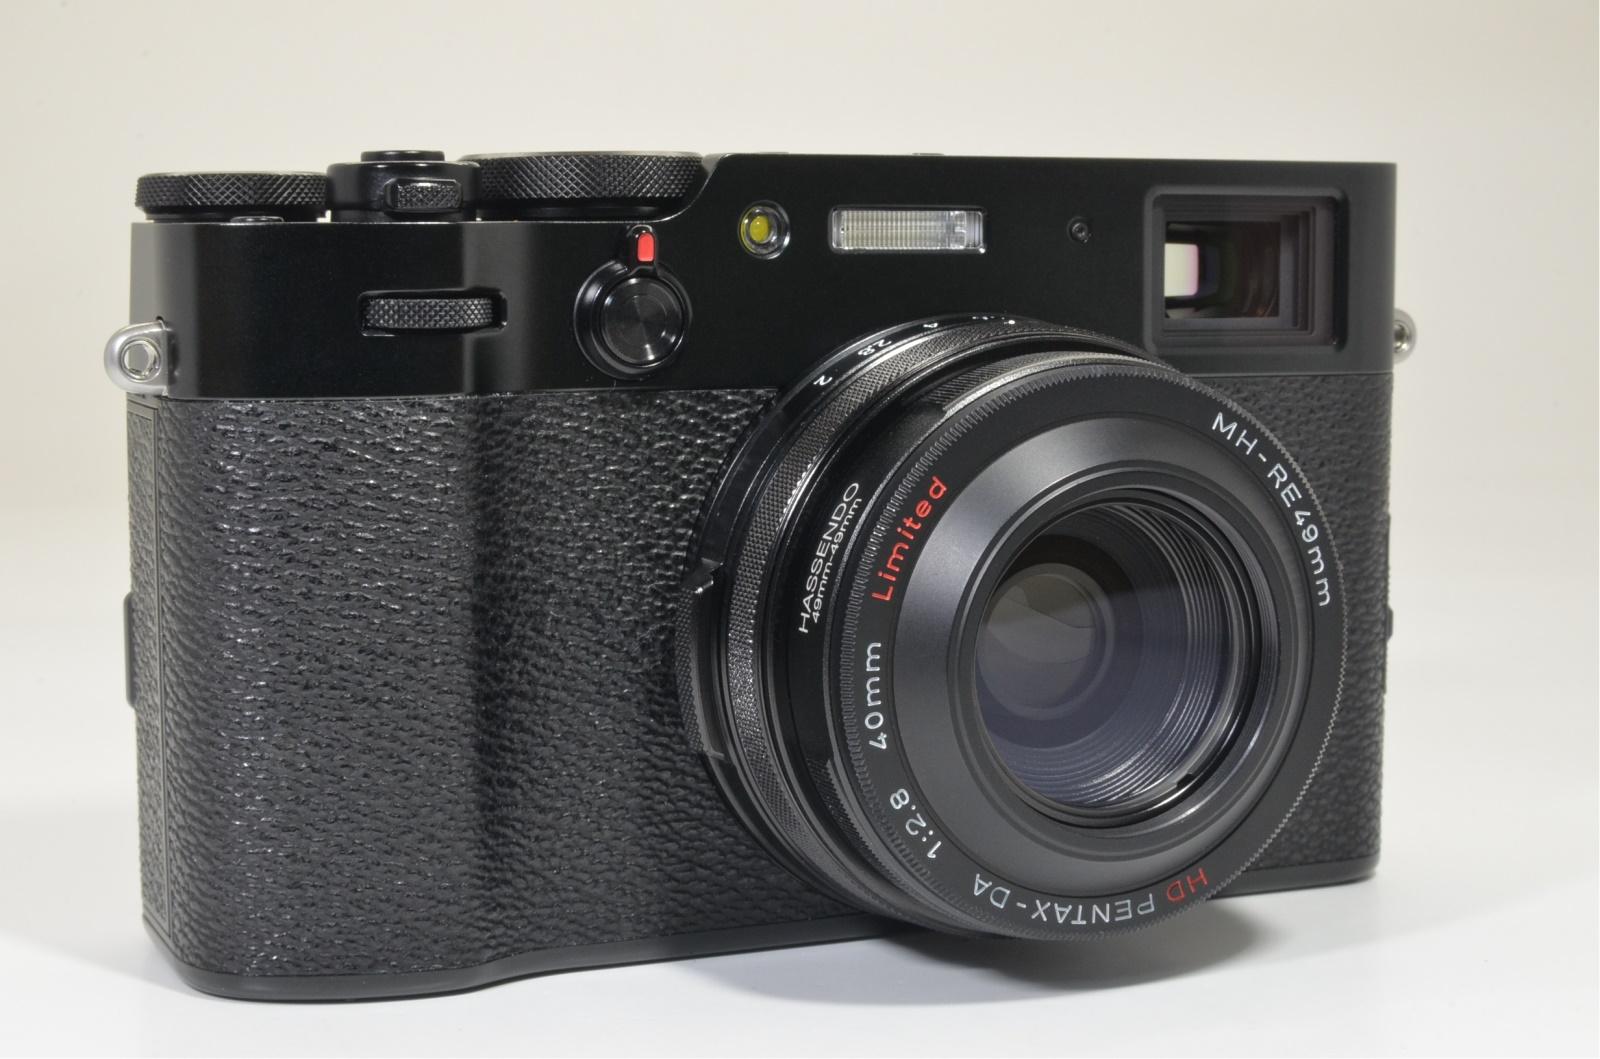 fuji fujifilm x100v black, wcl-x100ii and many accessories shutter count '2700'